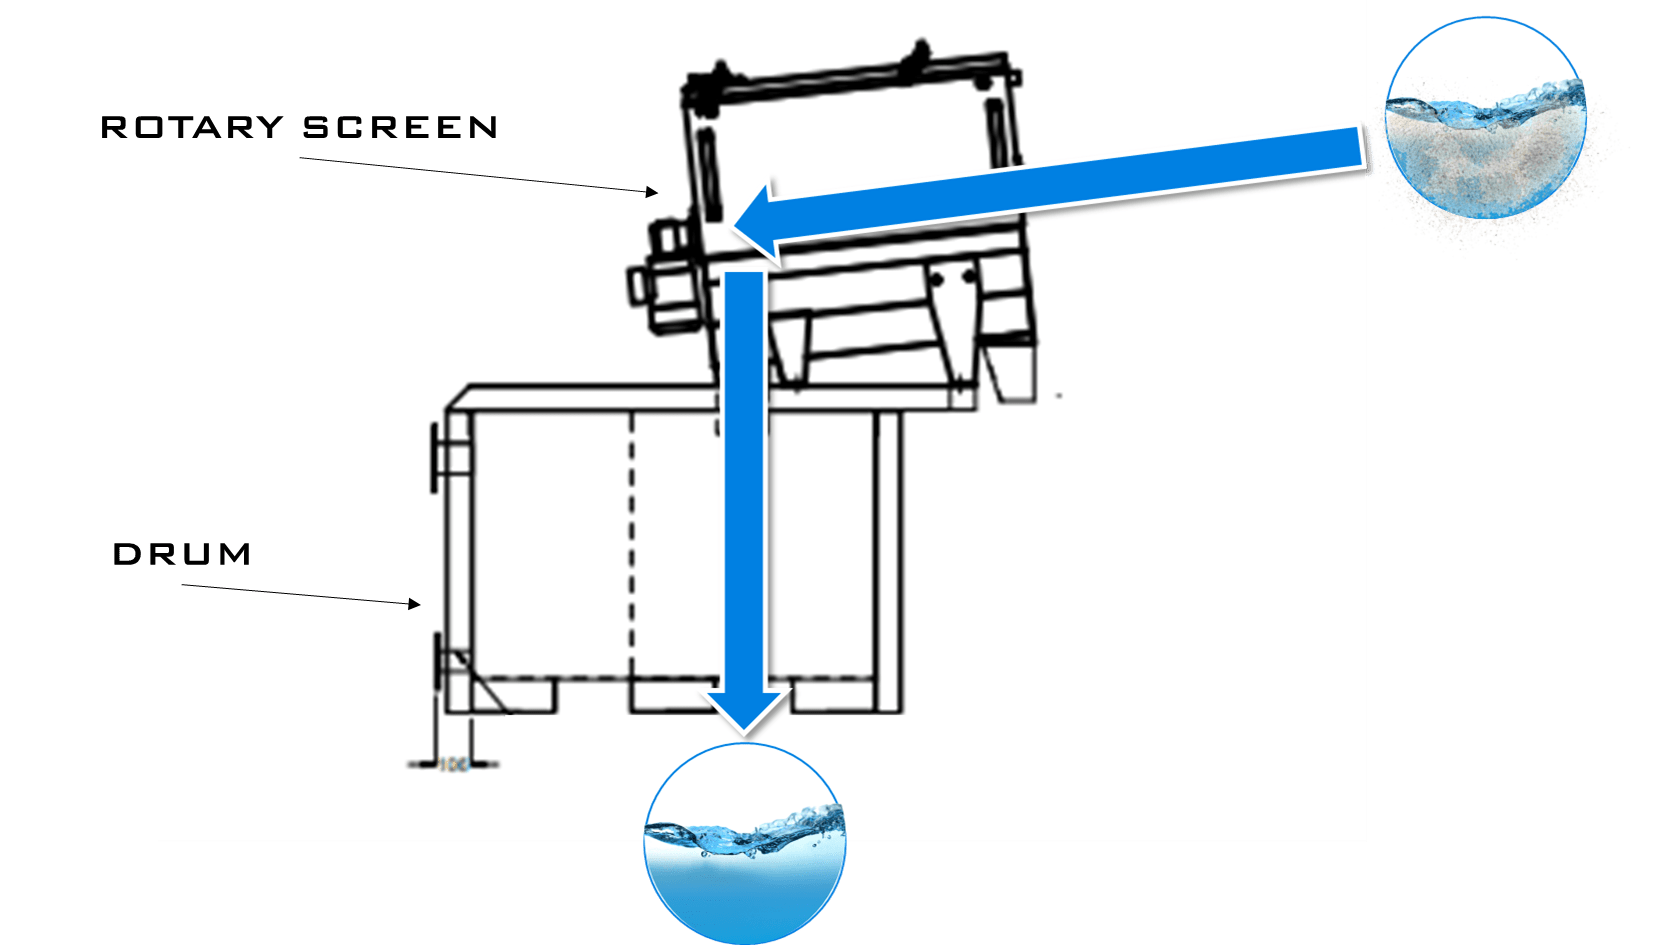 rotary screen diagram